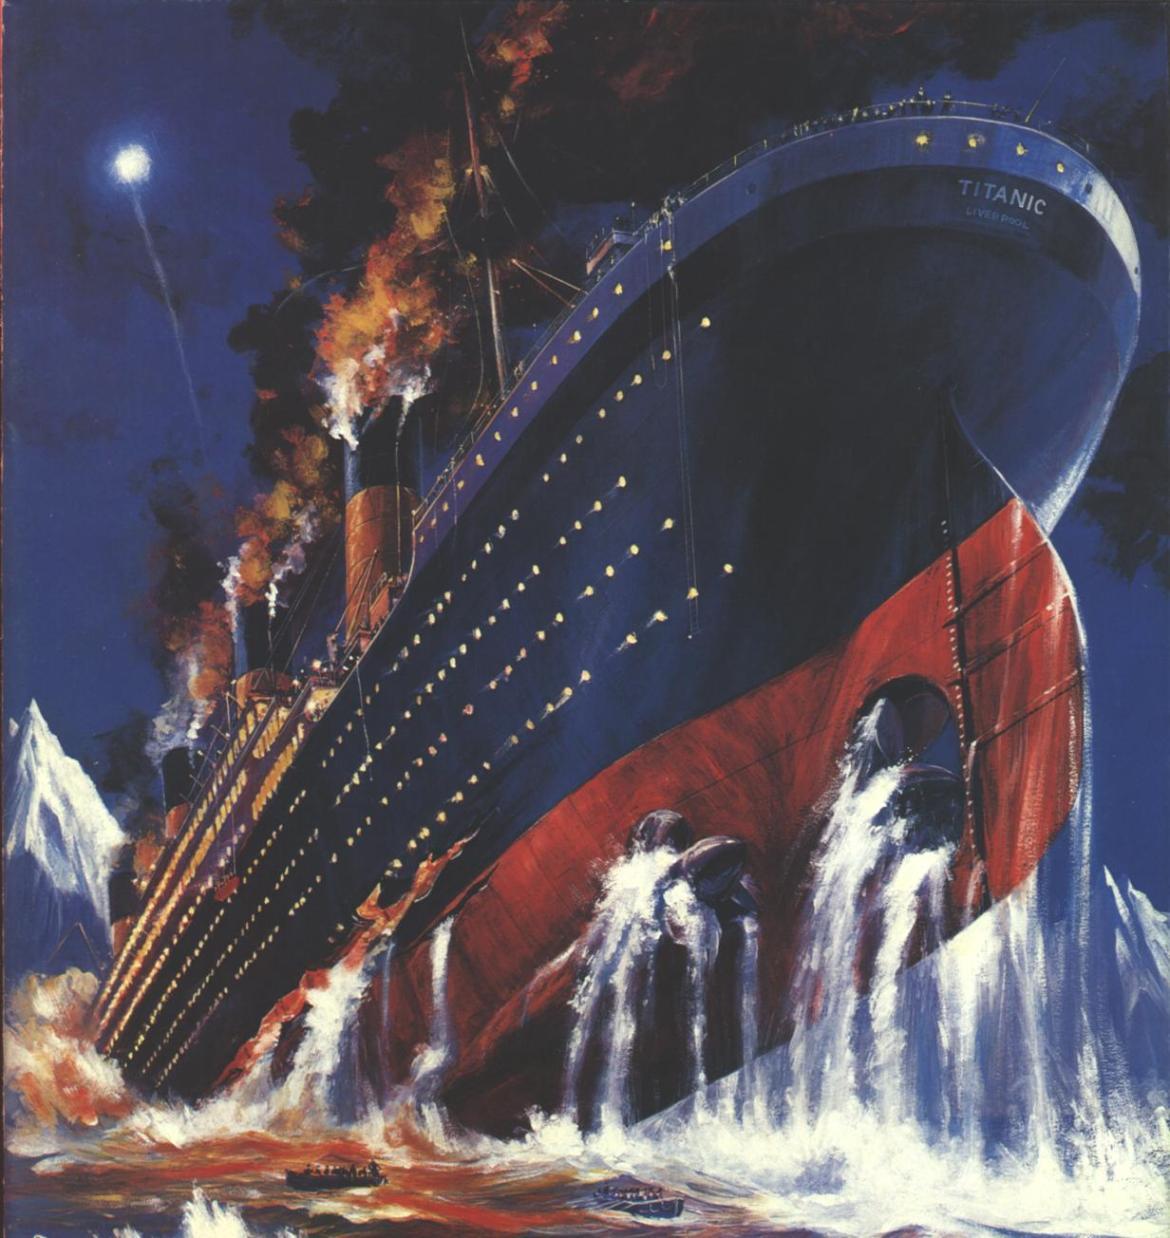 titanic-ship-SOS-message